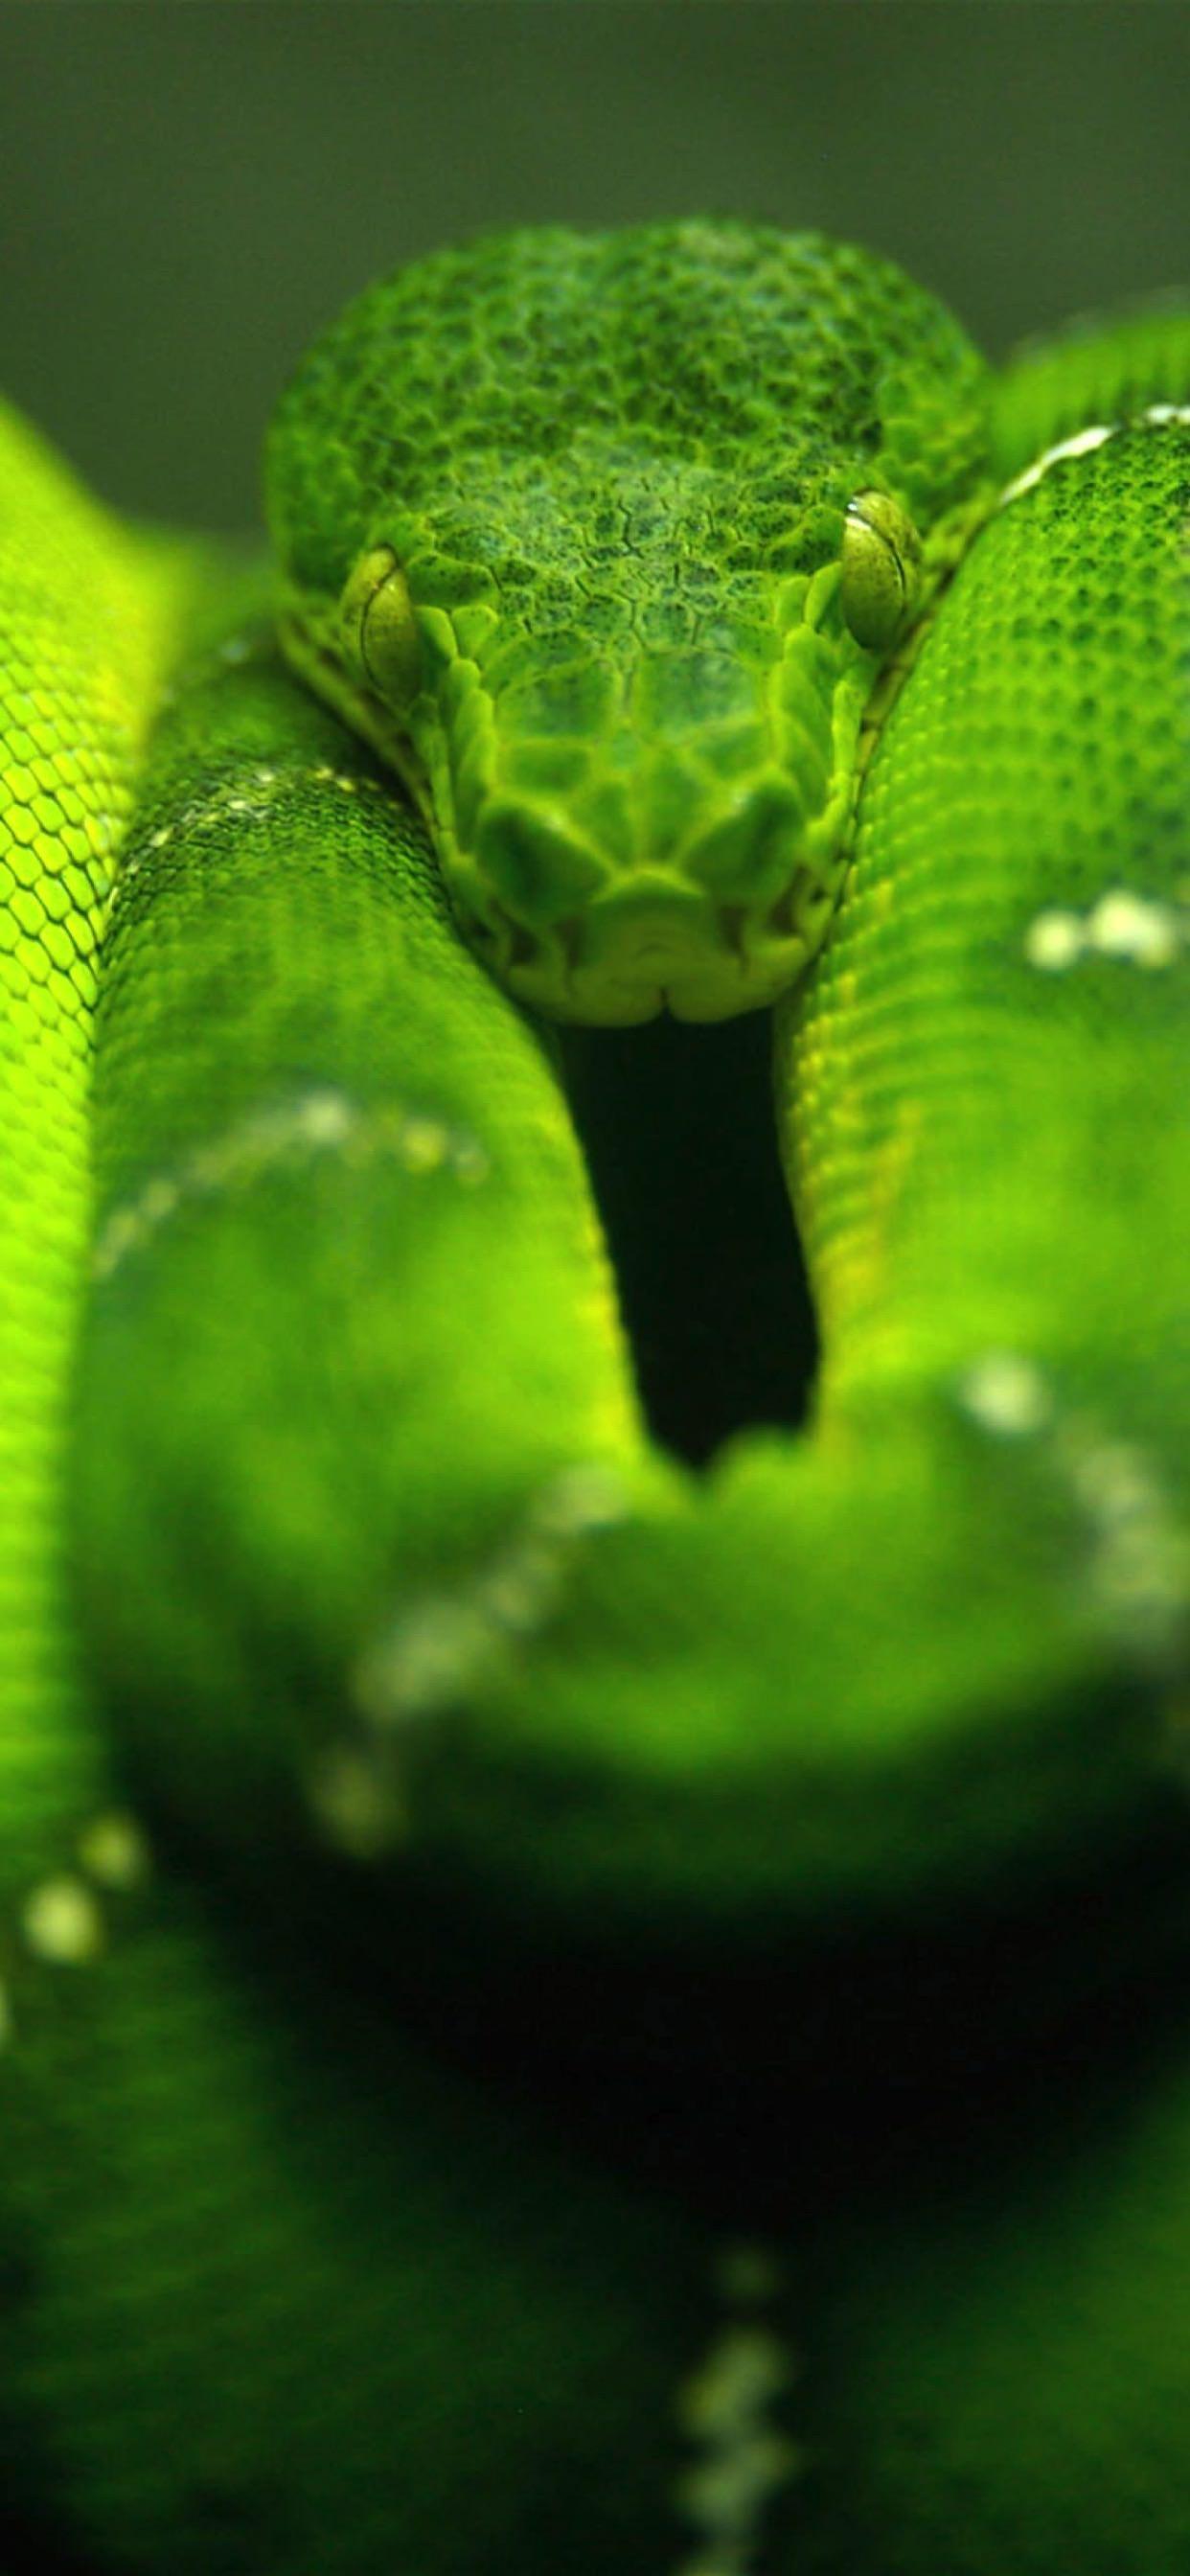 Animal Snake Green Wallpaper Sc Iphone Xs Max